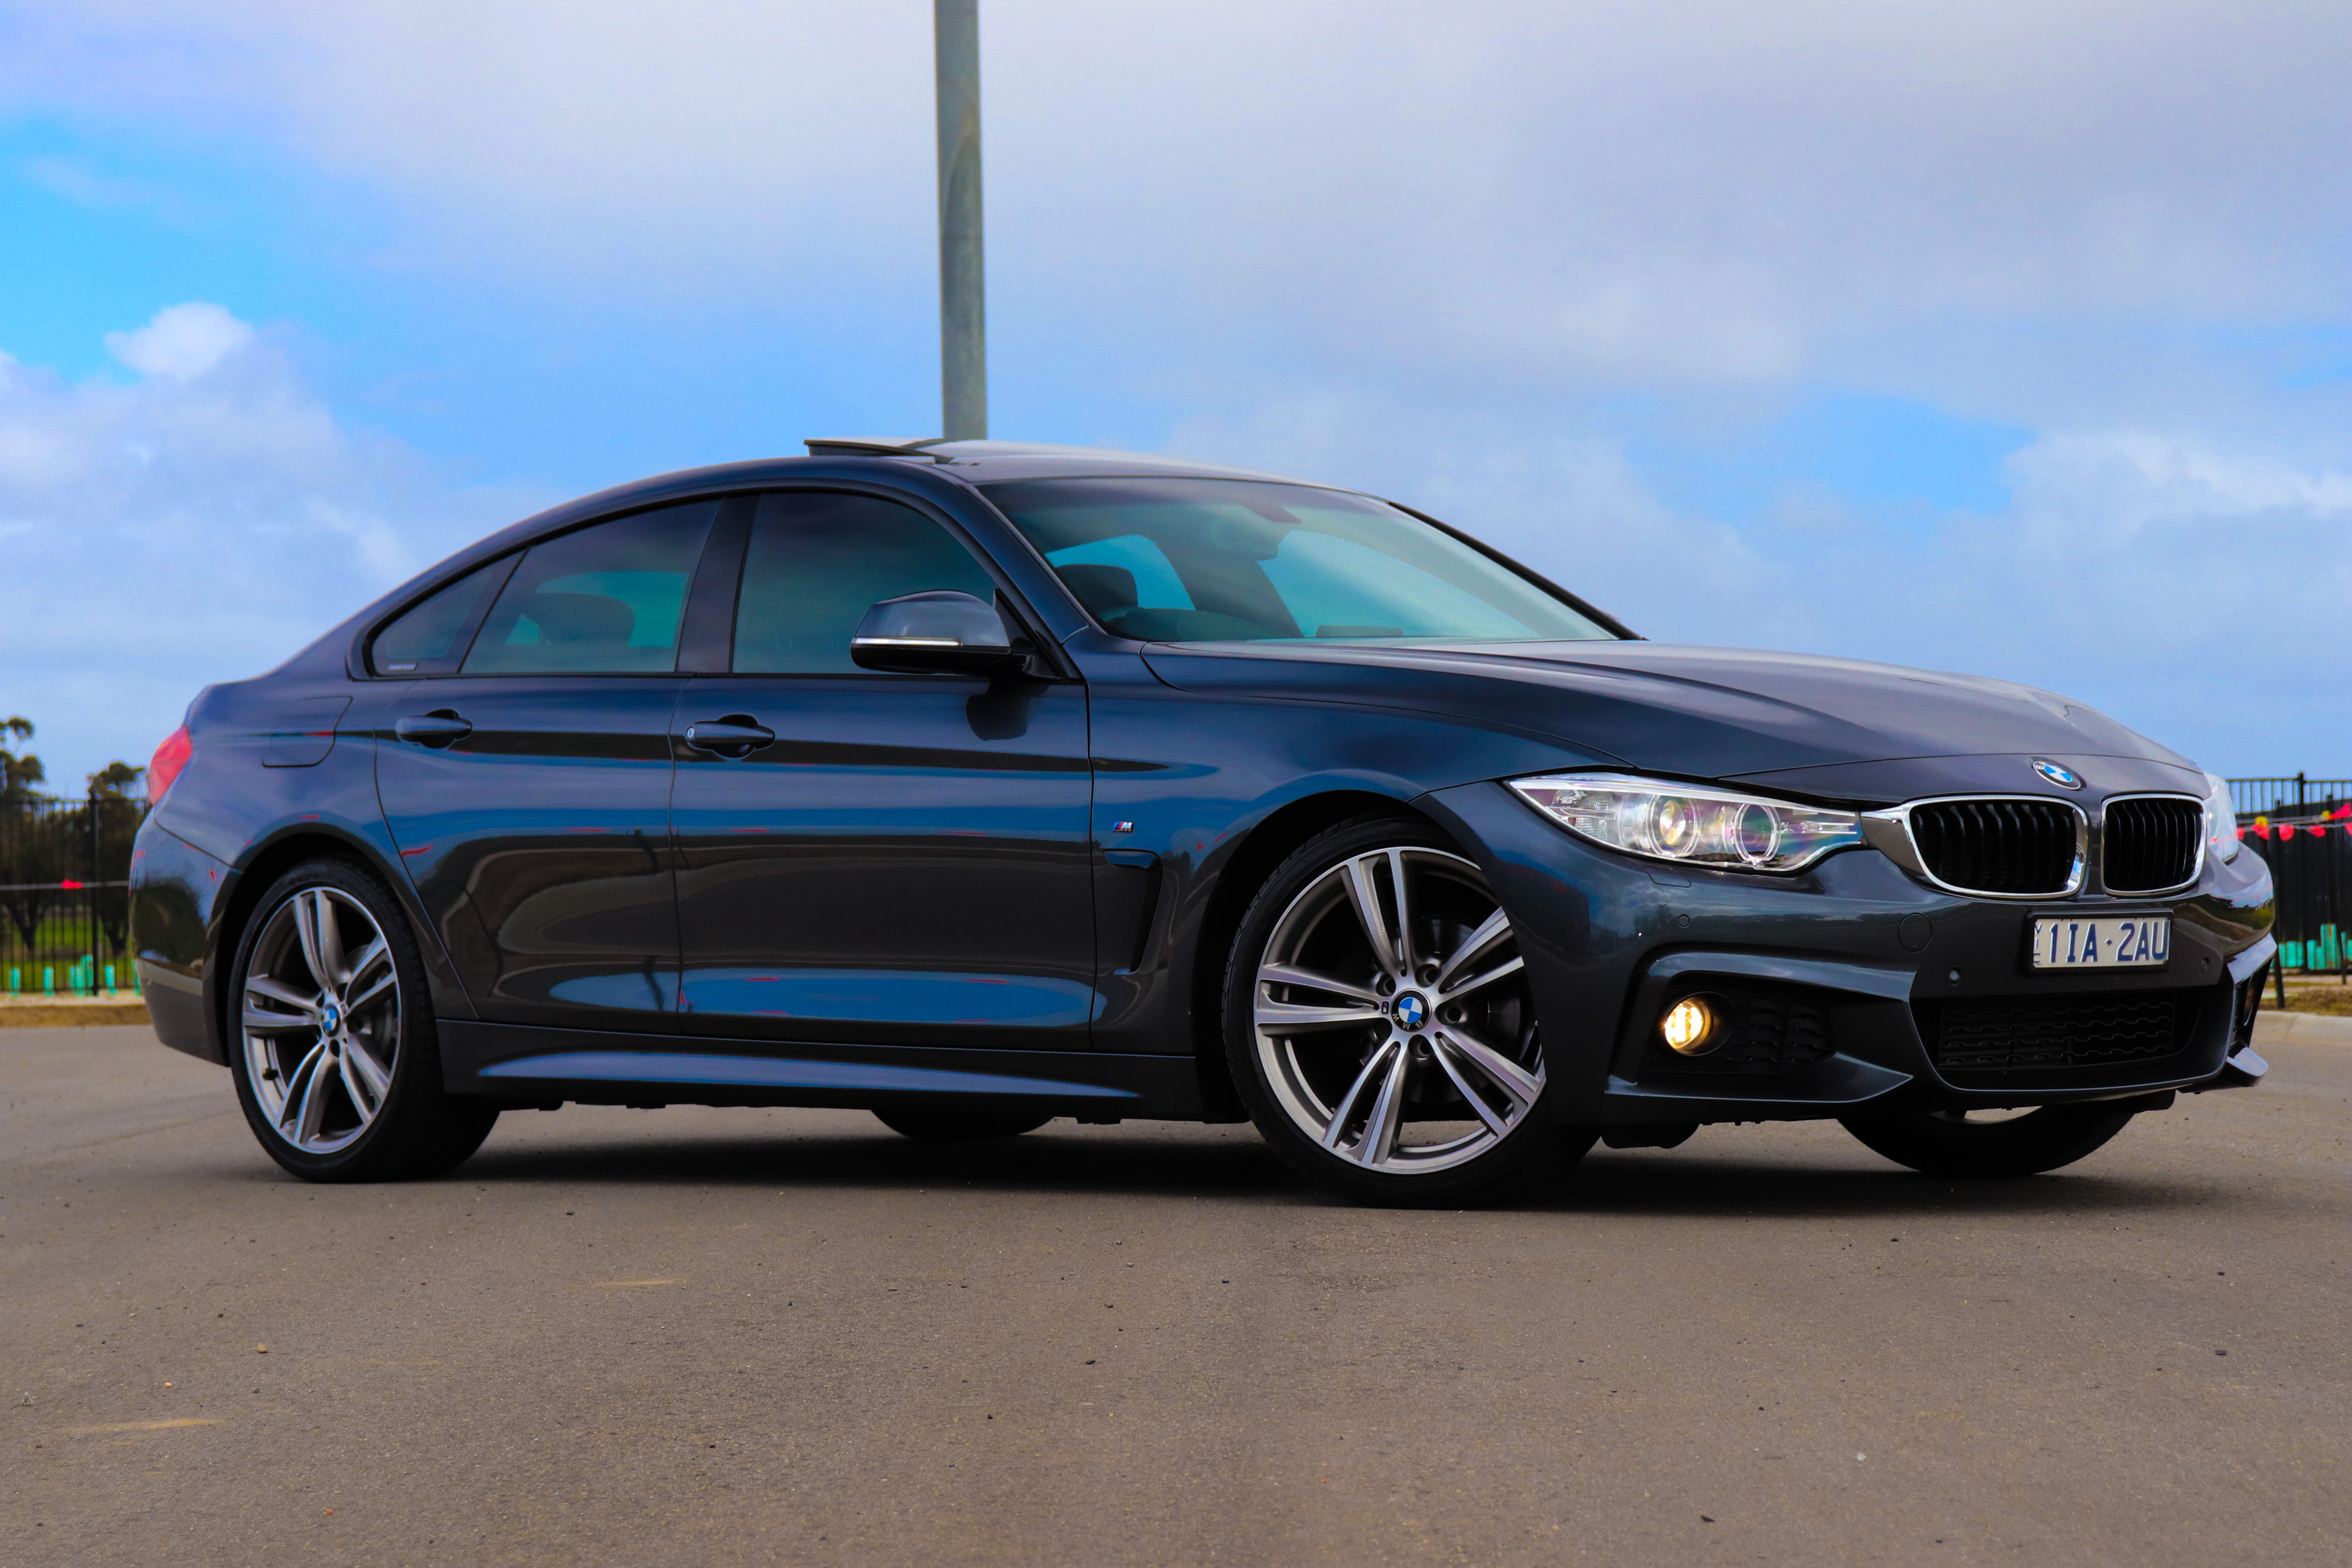 2016 BMW 420i M-sports Hatch - Find Me Cars